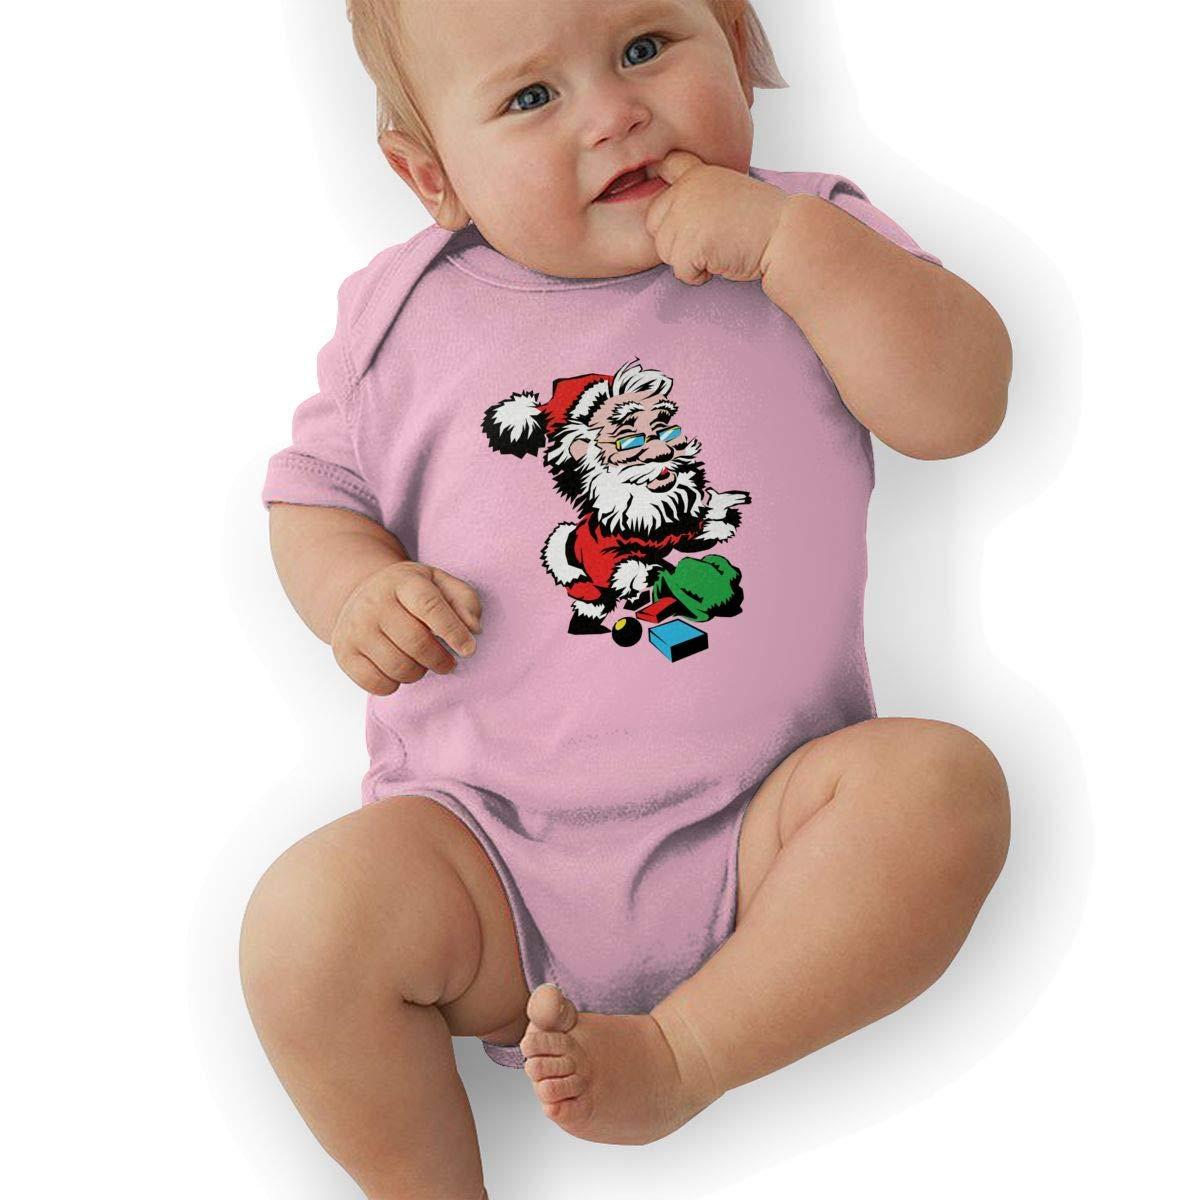 Infant Baby Girls Bodysuit Short-Sleeve Onesie Merry Christmas Funny Santa Print Outfit Summer Pajamas